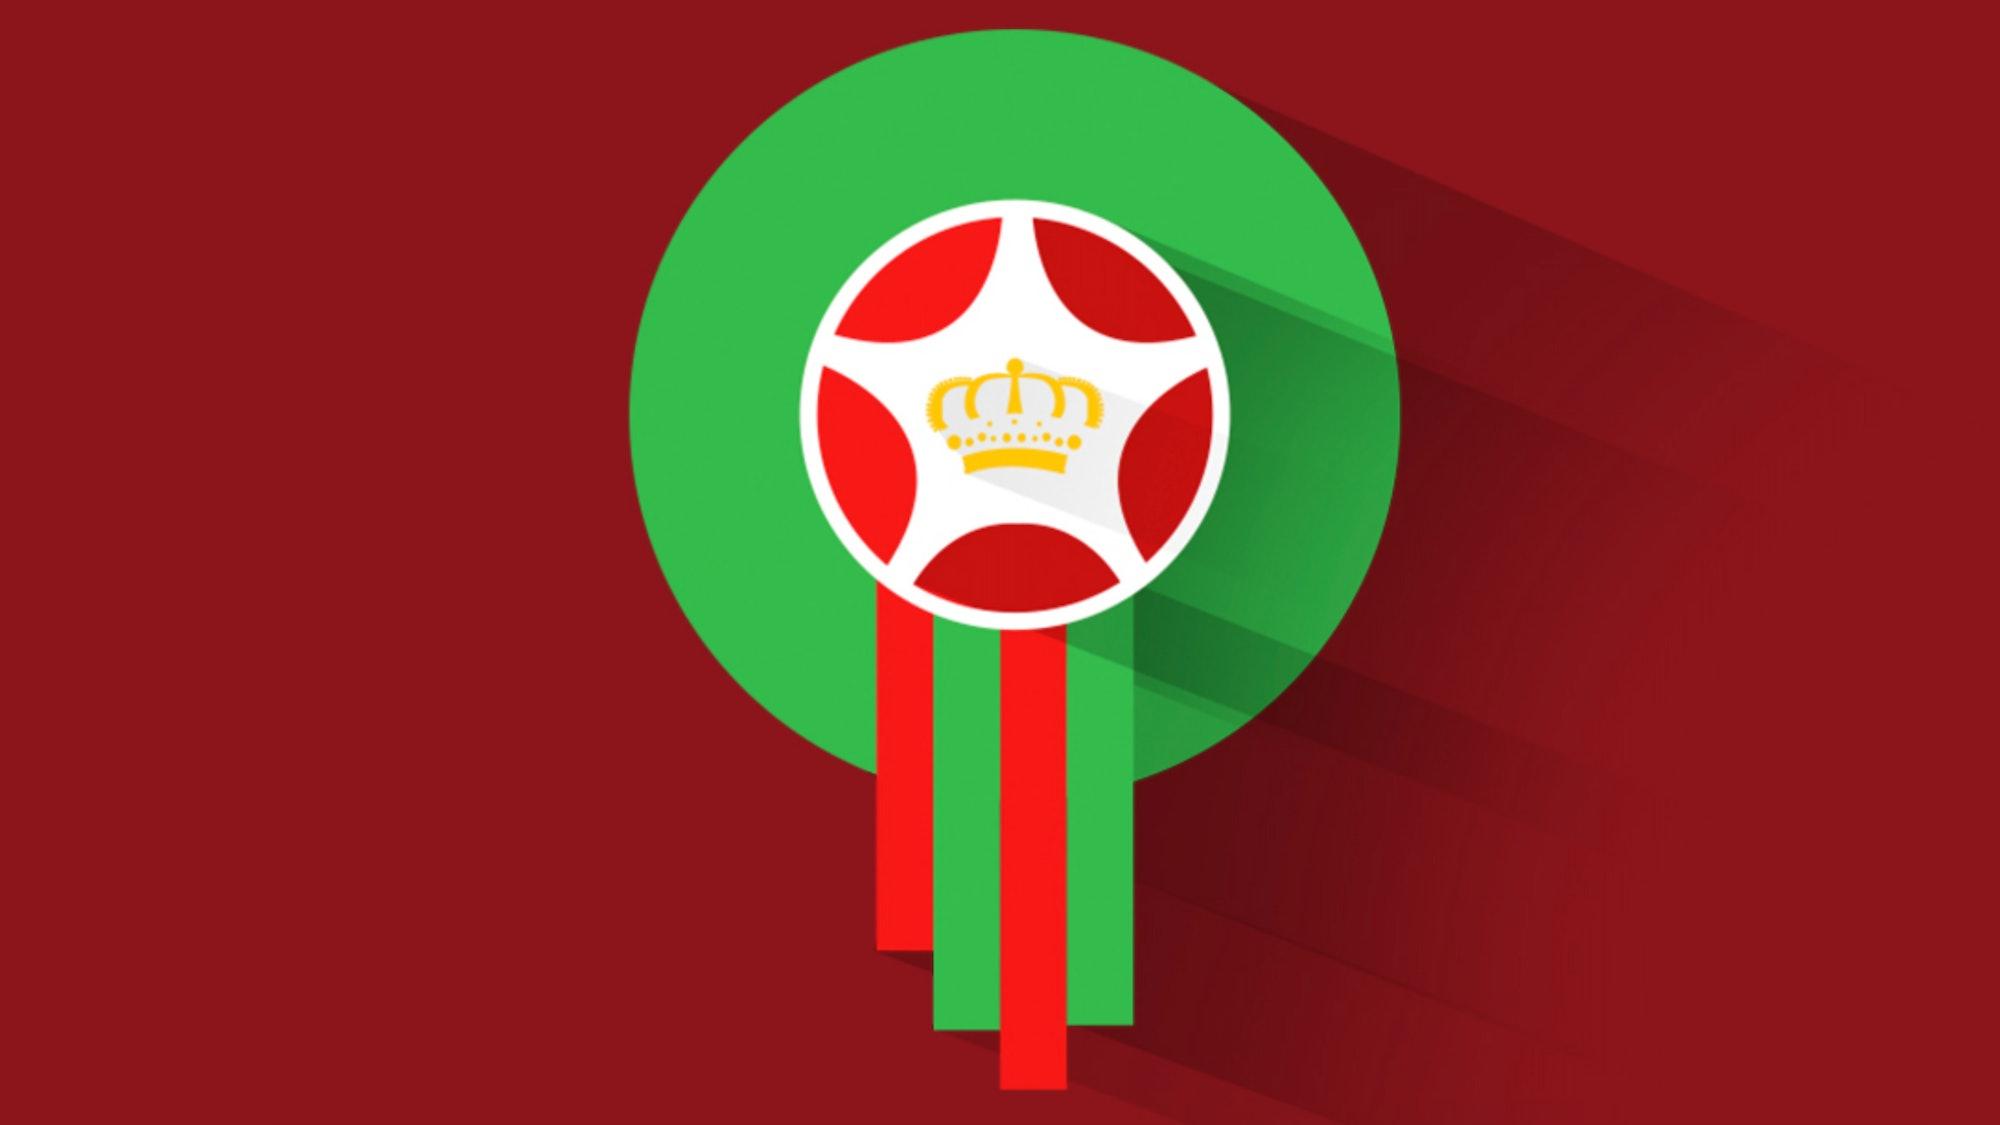 Morocco national footbal team crest